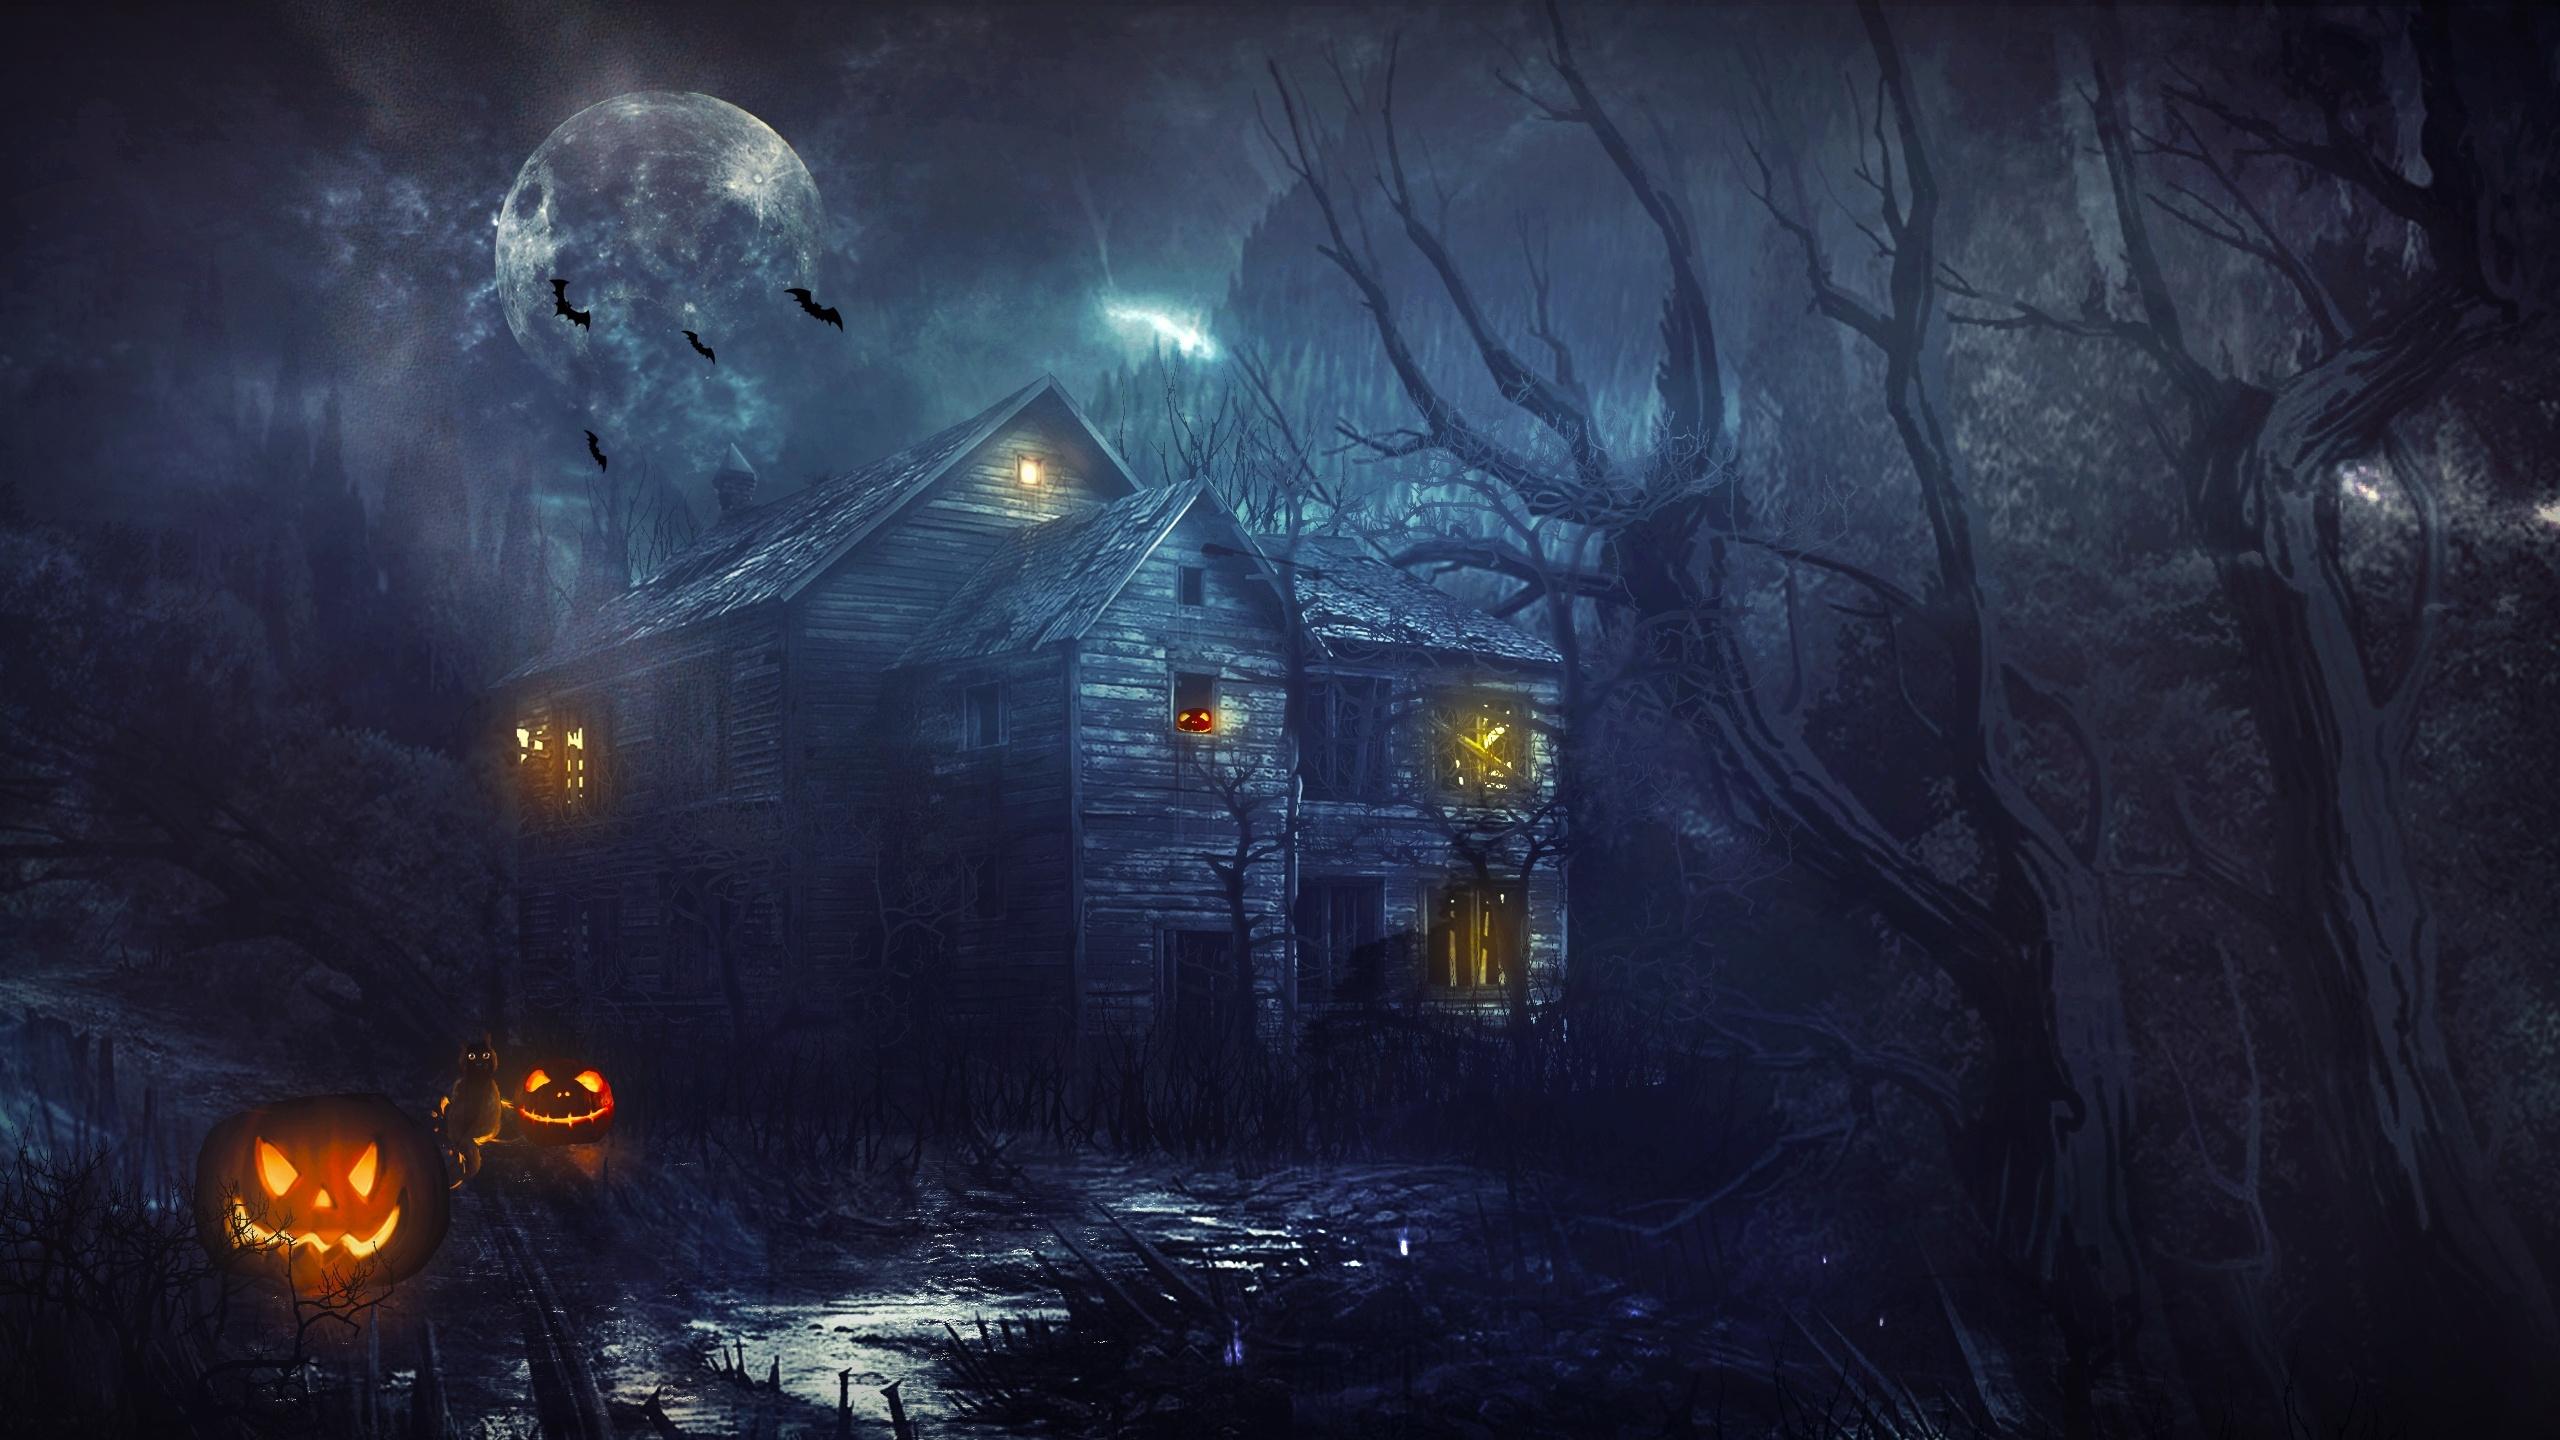 Haunted house wallpaper 31301 2560x1440